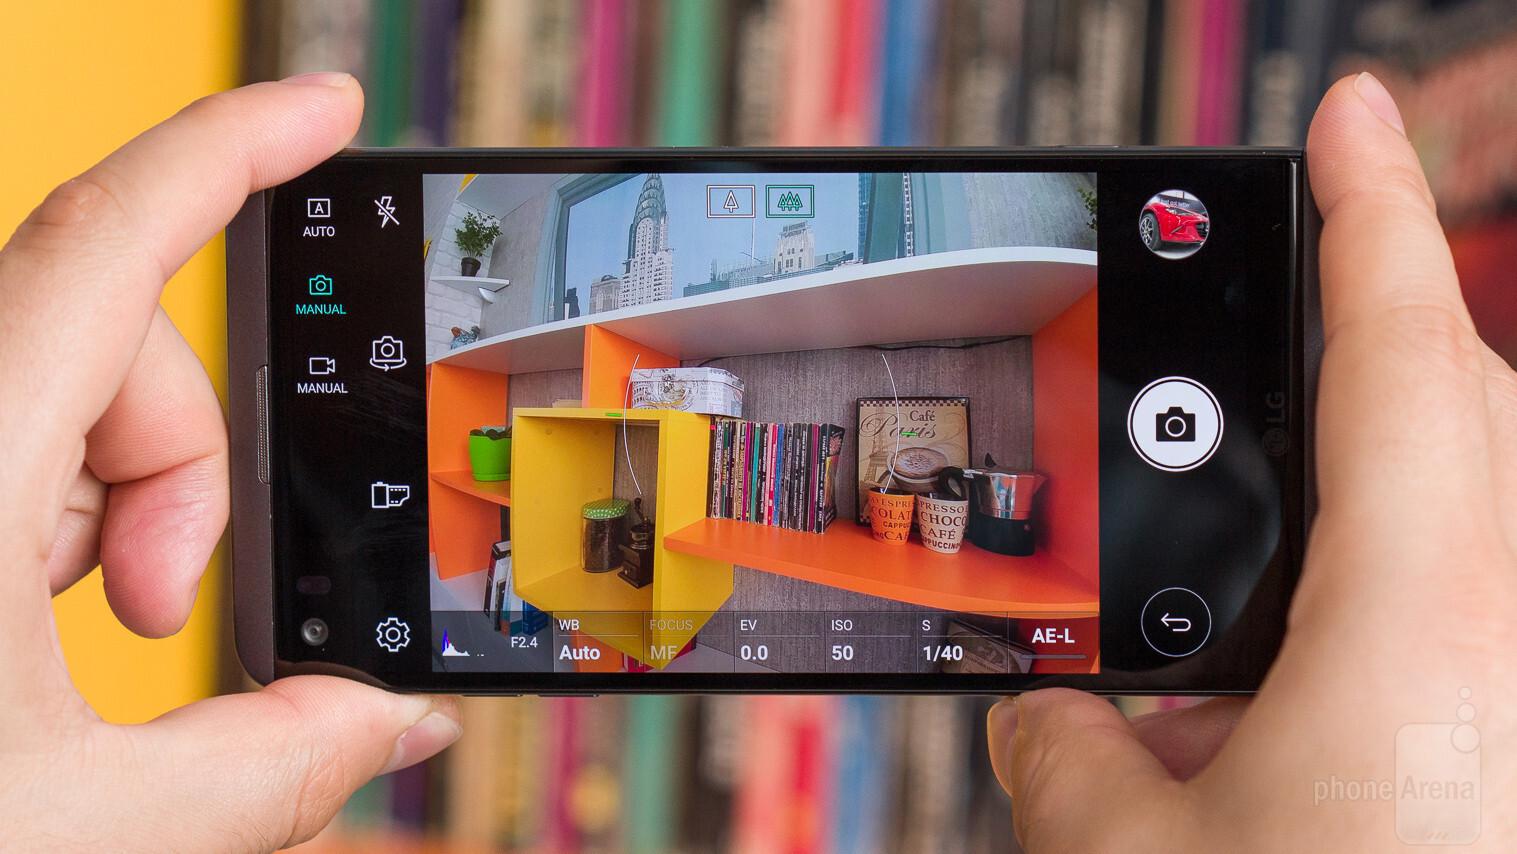 LG V20 Review - Camera and Multimedia - PhoneArena